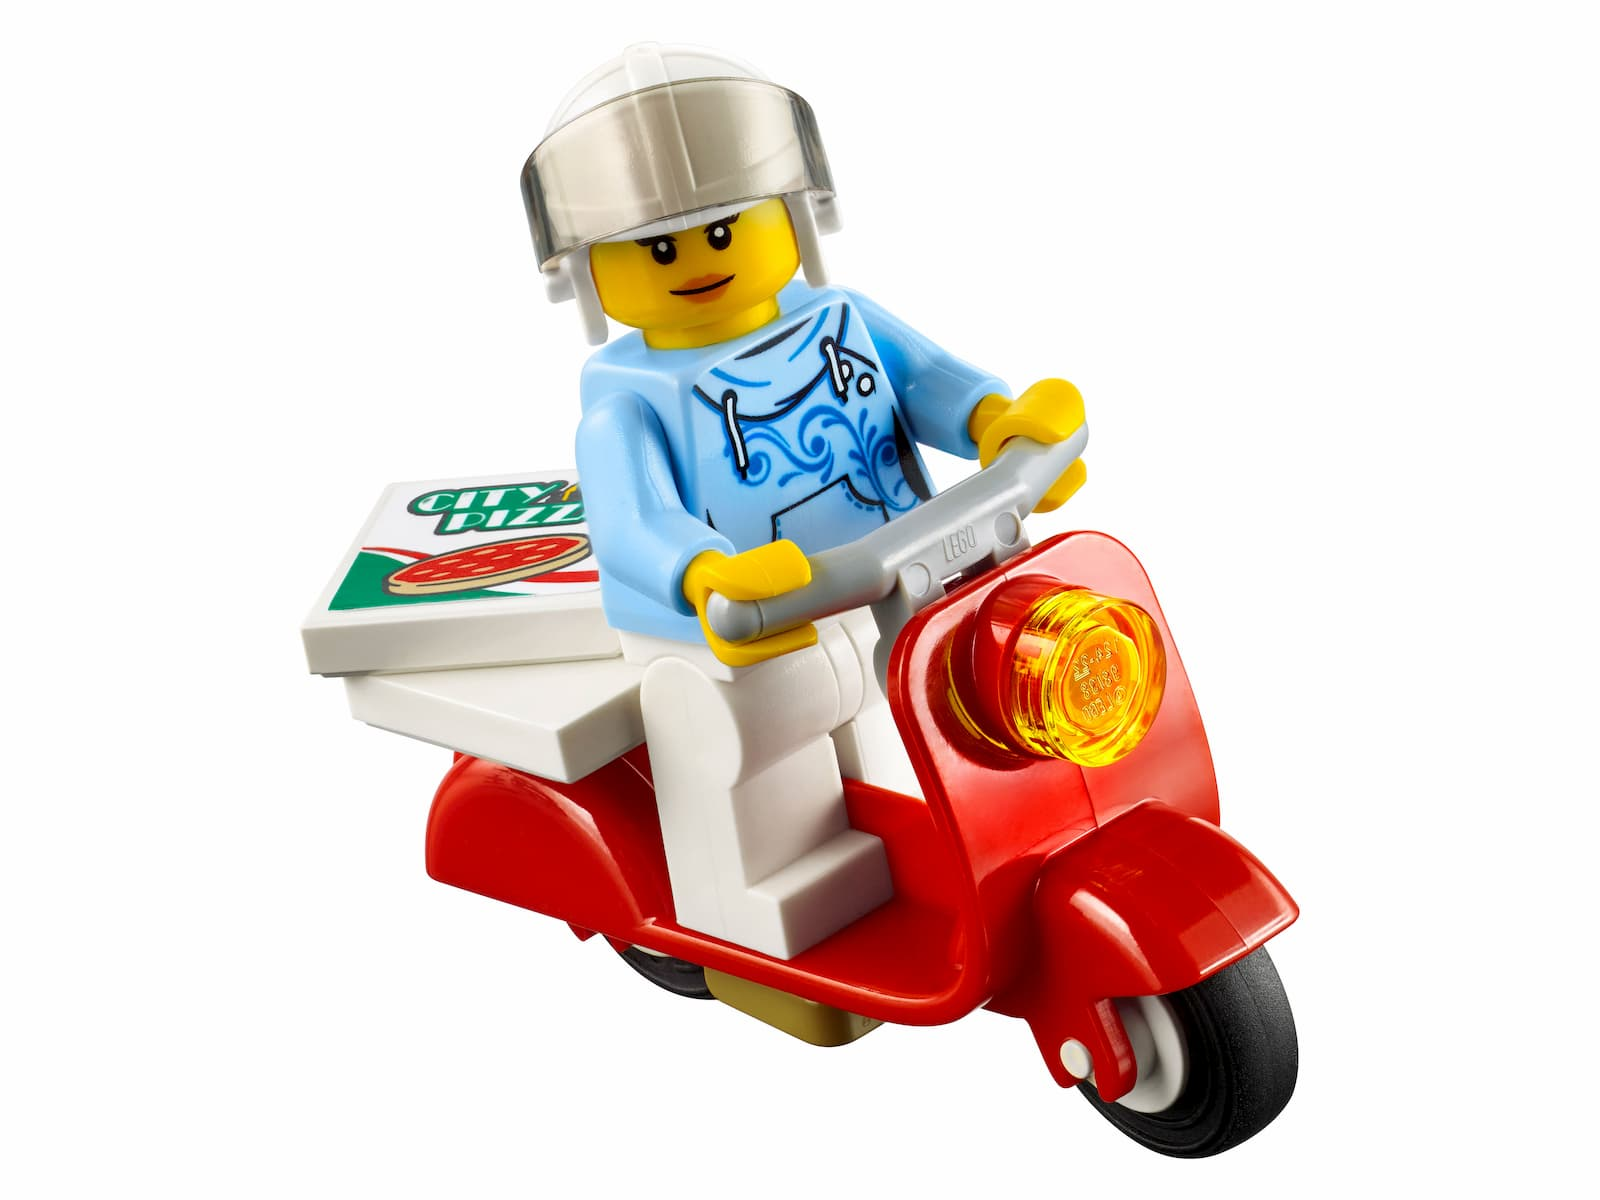 Конструктор Bl «Фургон-пиццерия» 10648 (City 60150) / 261 деталь